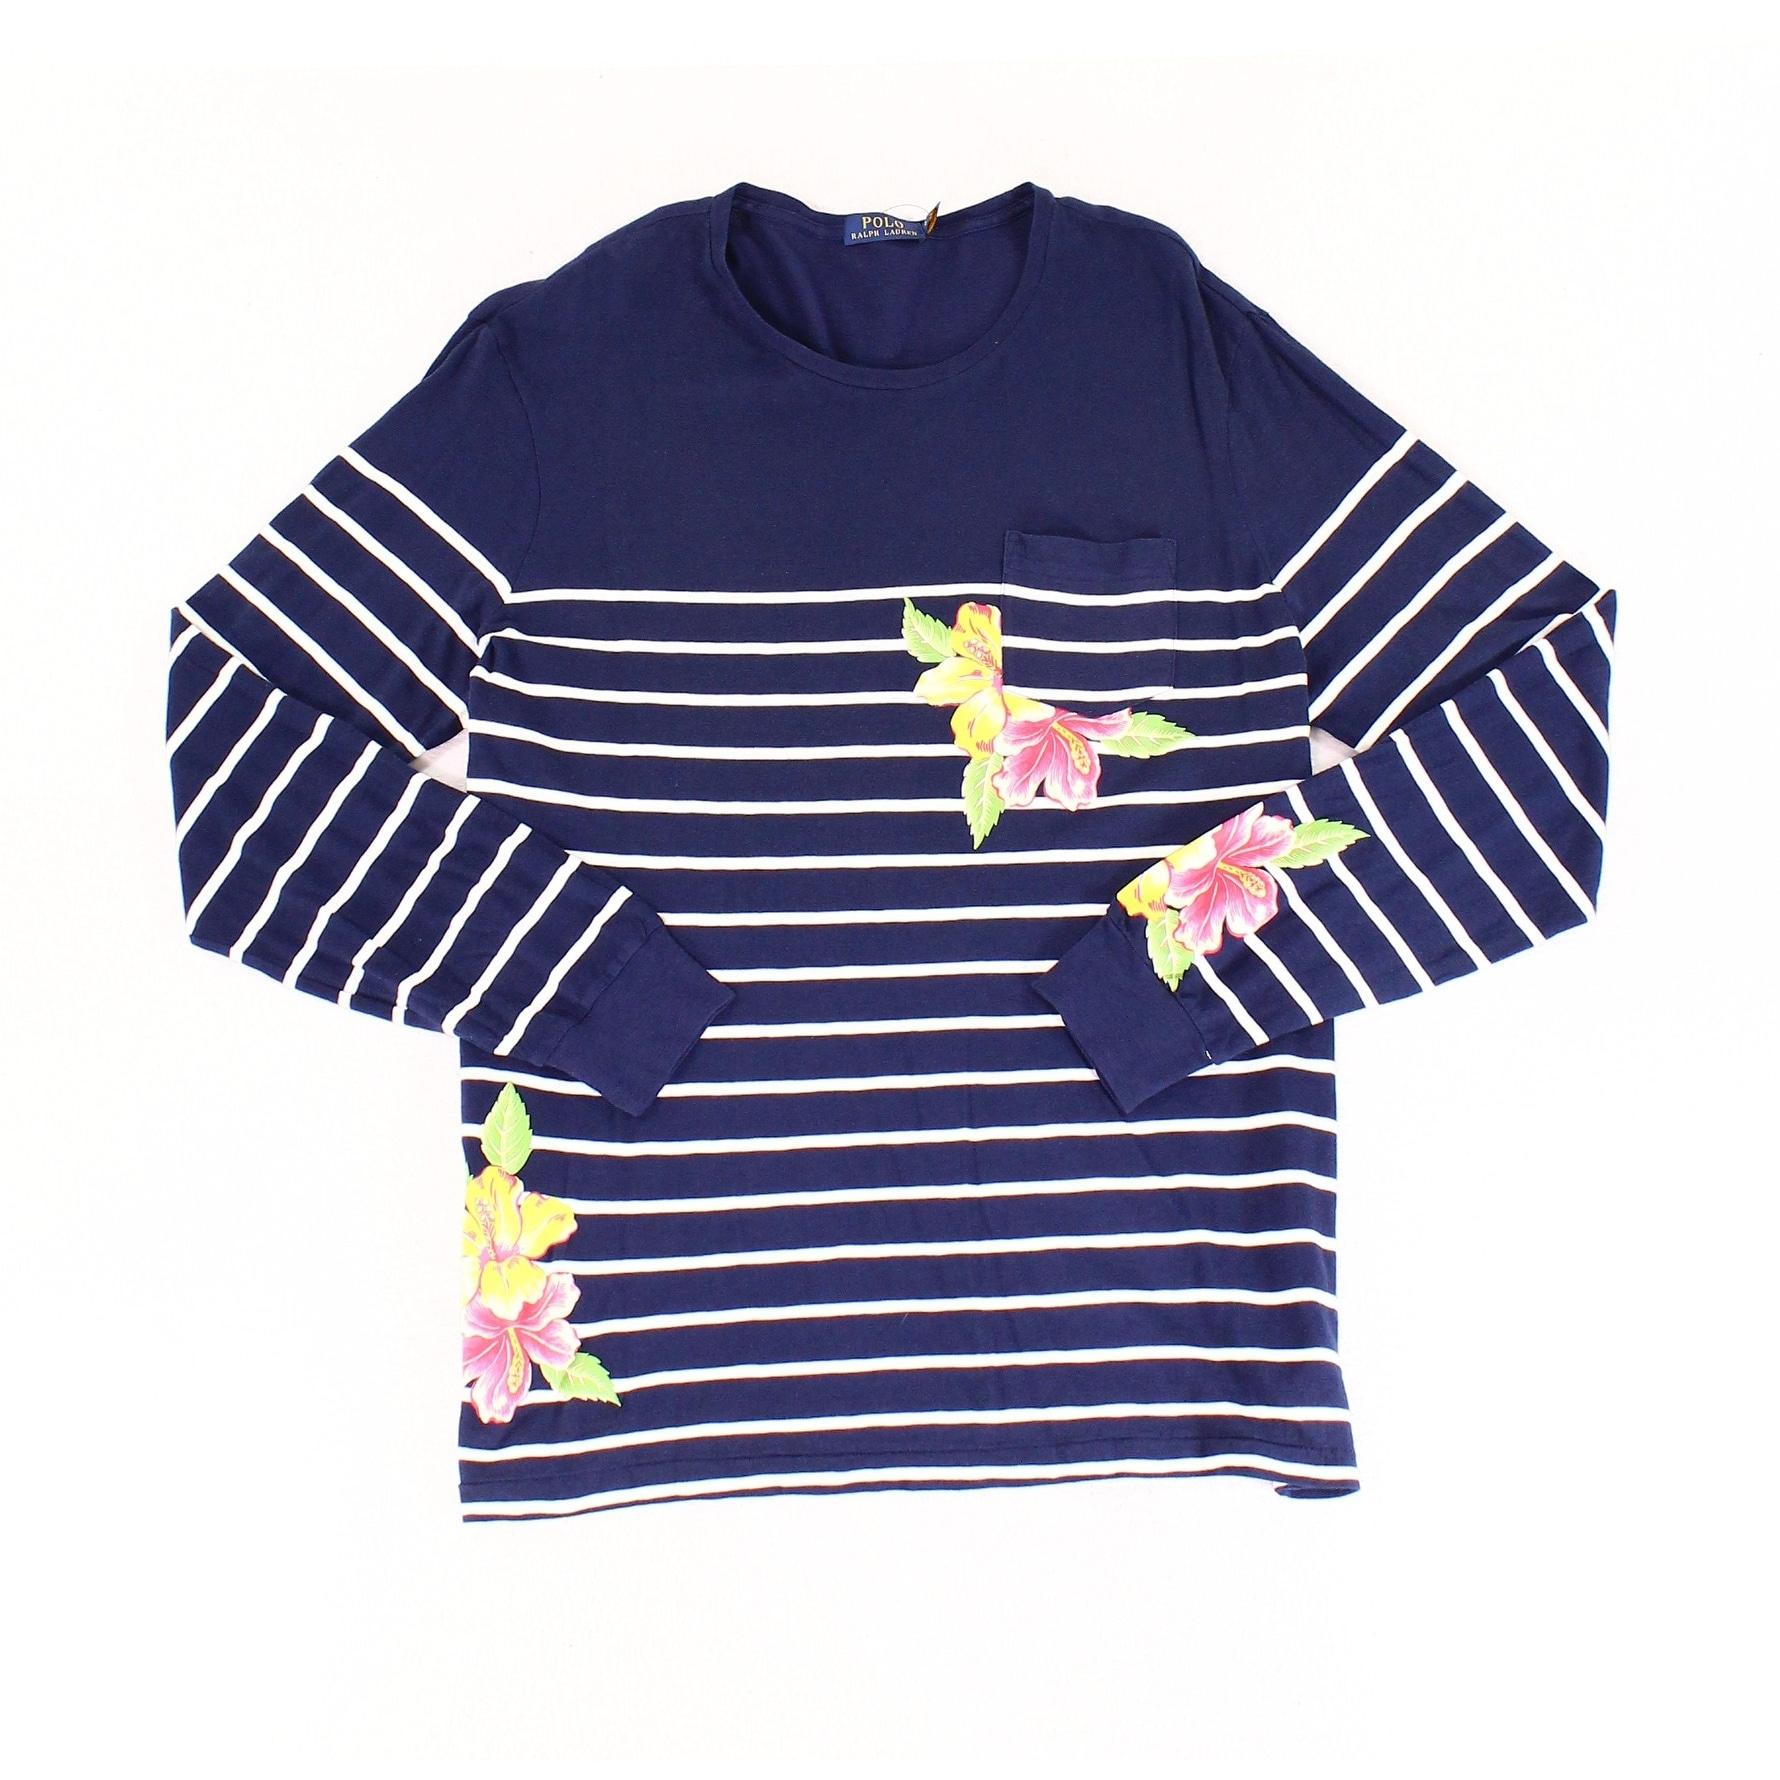 F1f18 Mens Striped 5cd1d Shirt Inexpensive Lauren Ralph T 5AR3jqcLS4